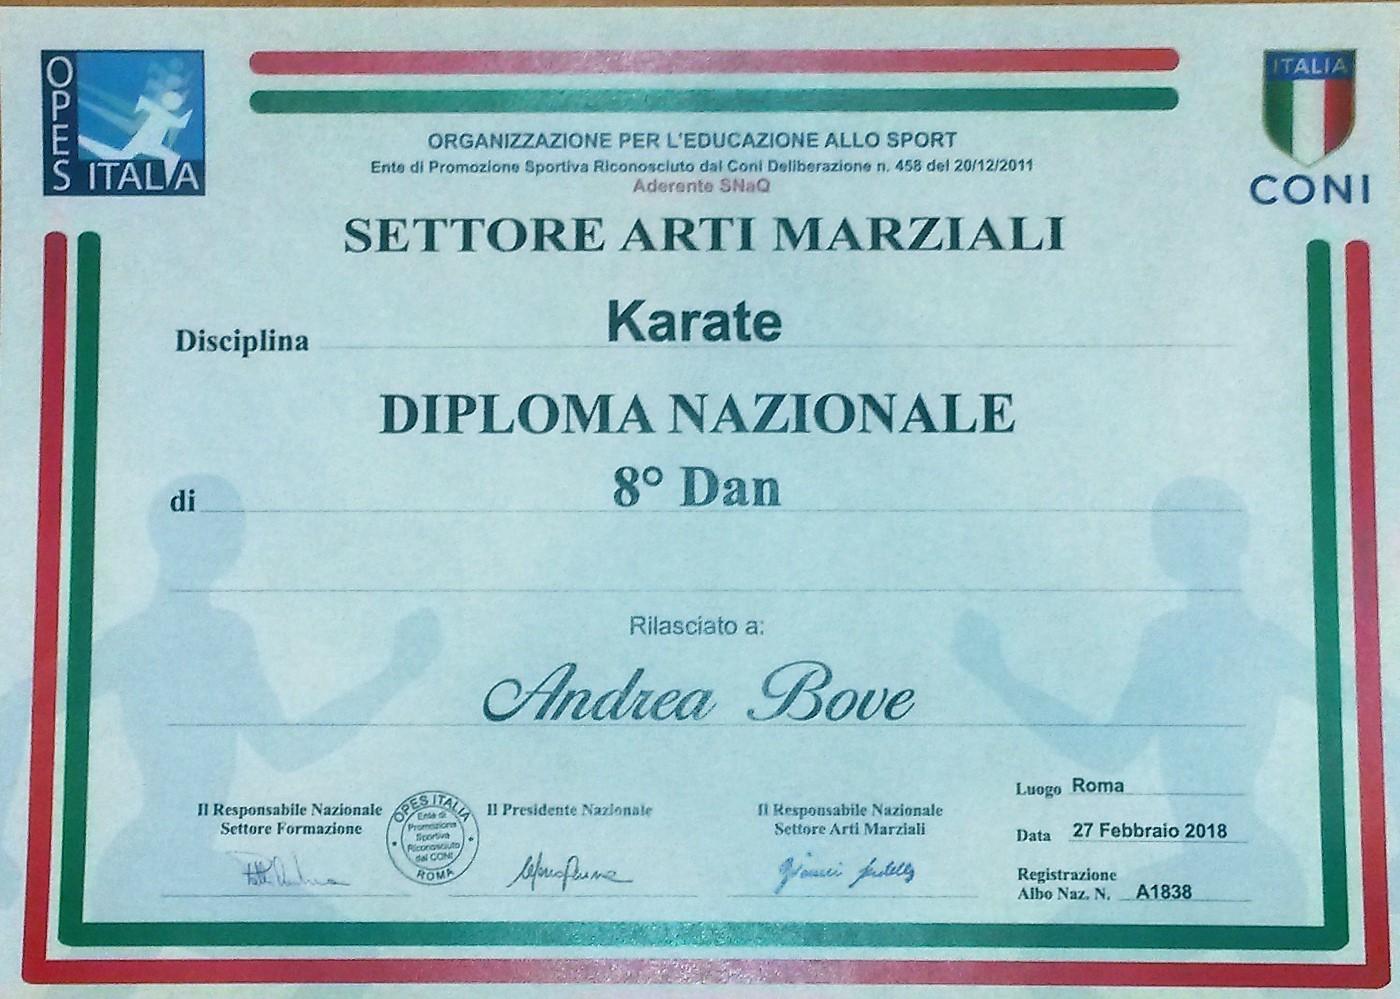 Maestro Andrea Bove 8° Dan Karate OPES